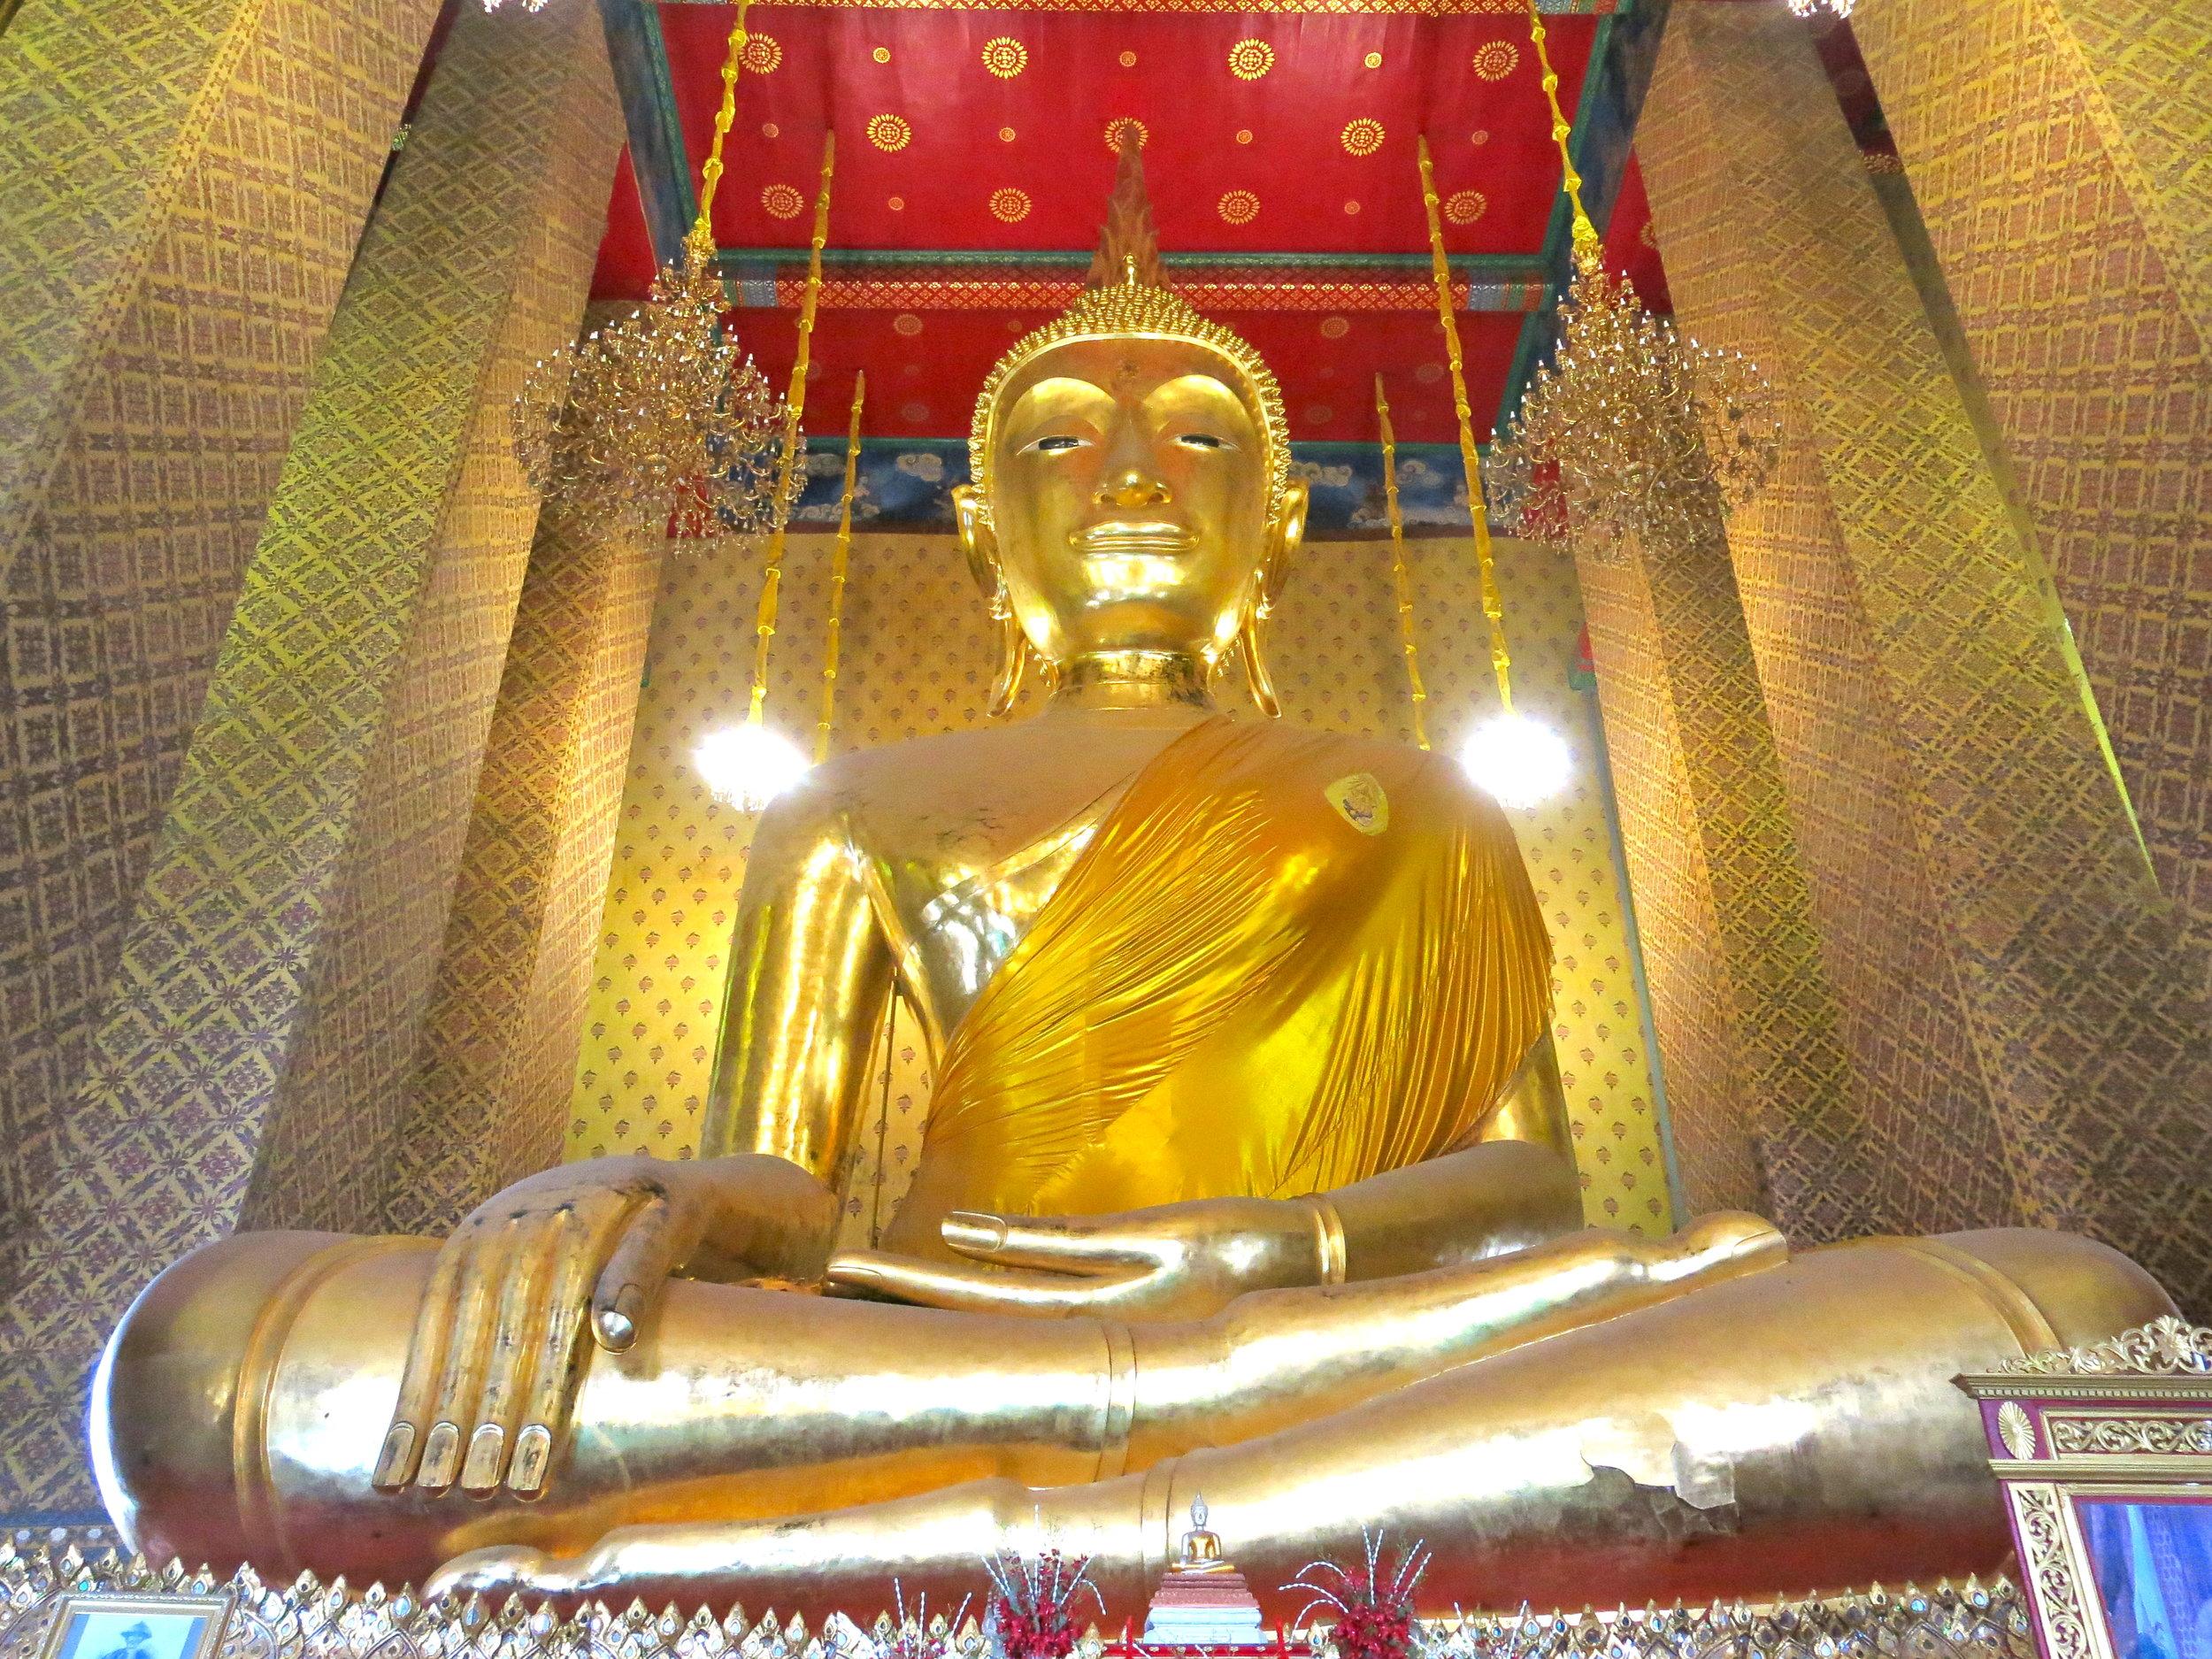 Giant Buddha at the Wat Kalayanamit